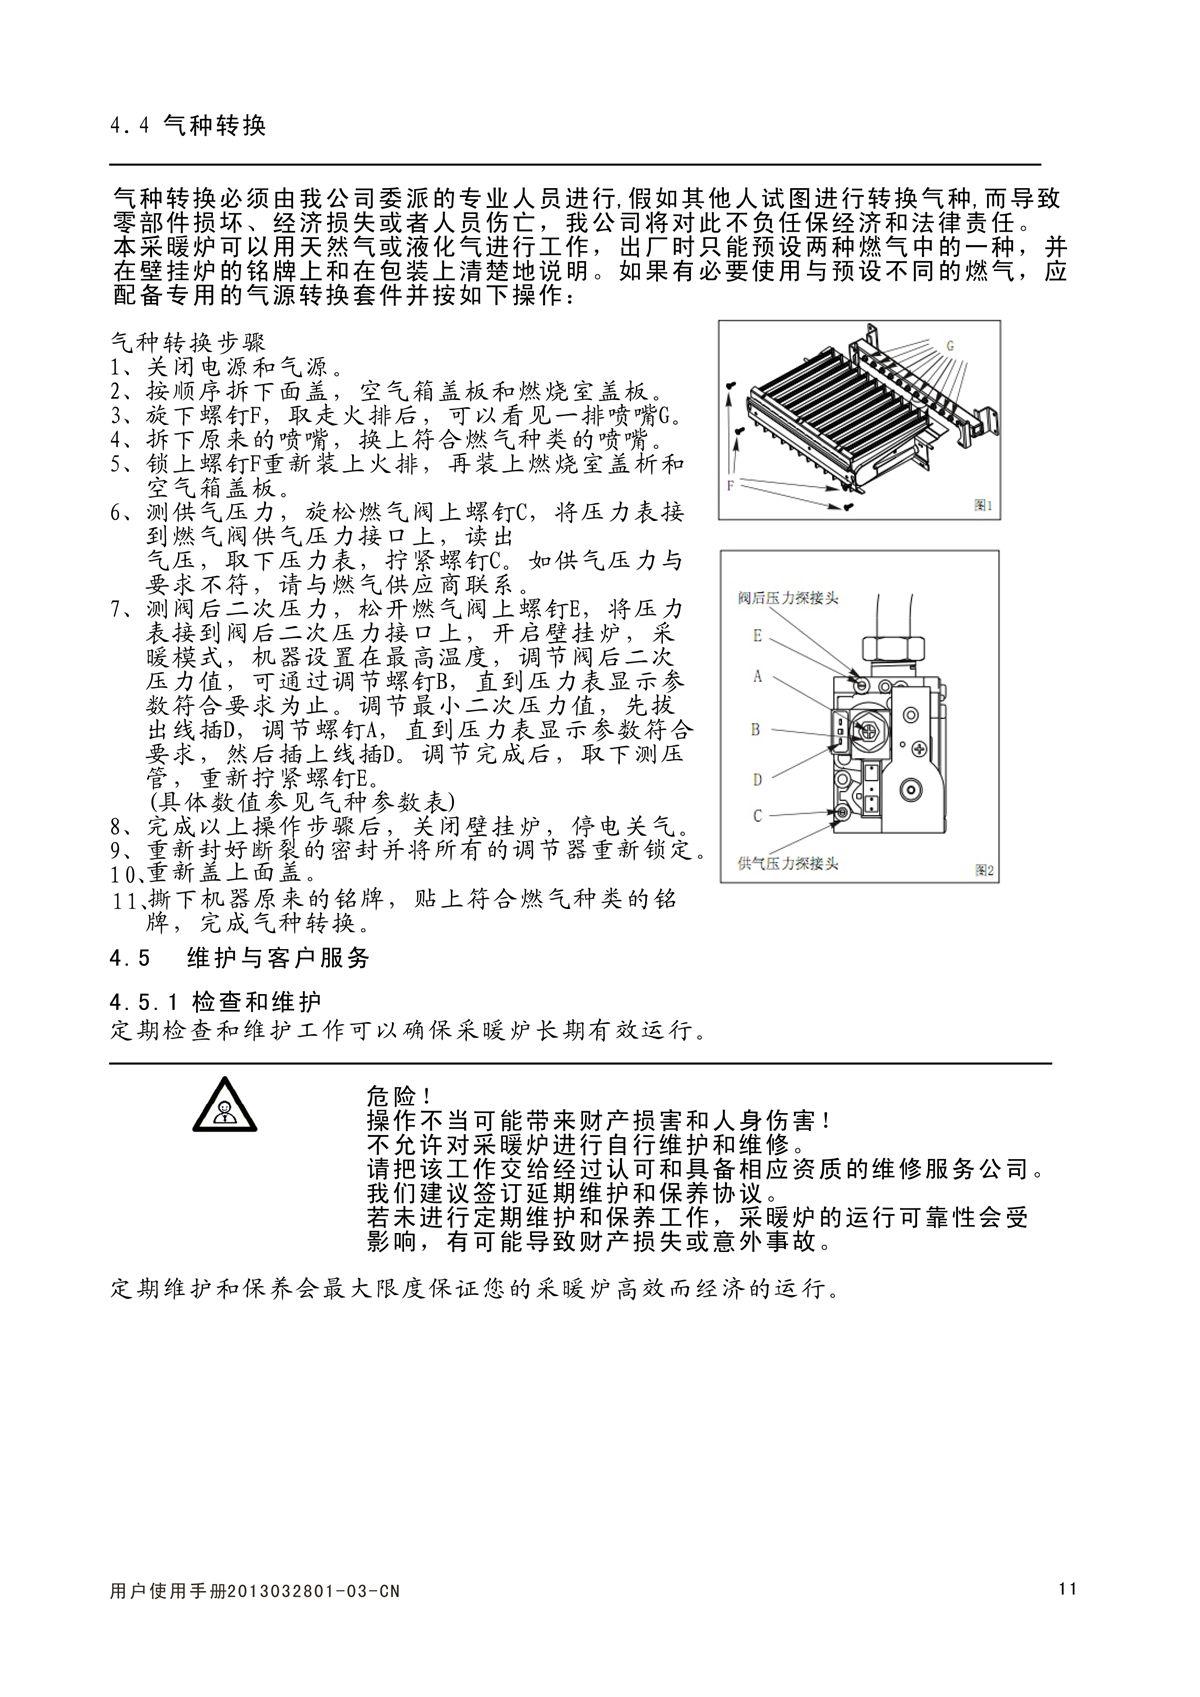 ES02系列-用户使用手册-7_02.jpg